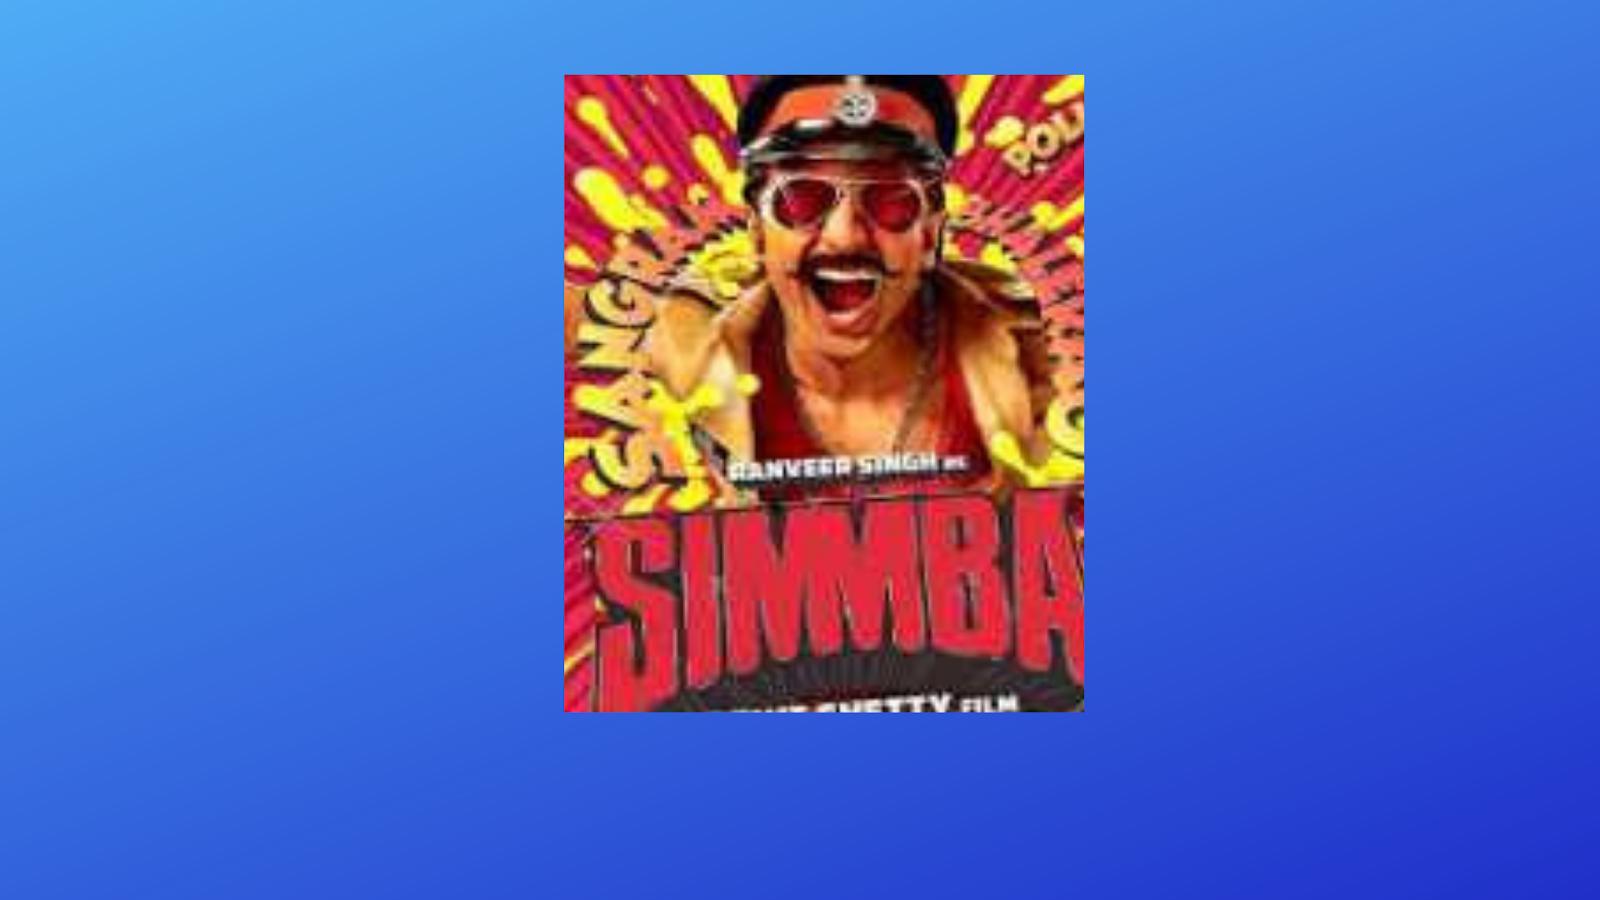 Simmba 2018 Hindi Movie Mp4moviez Hd Mp4 Movieslatest Bollywood